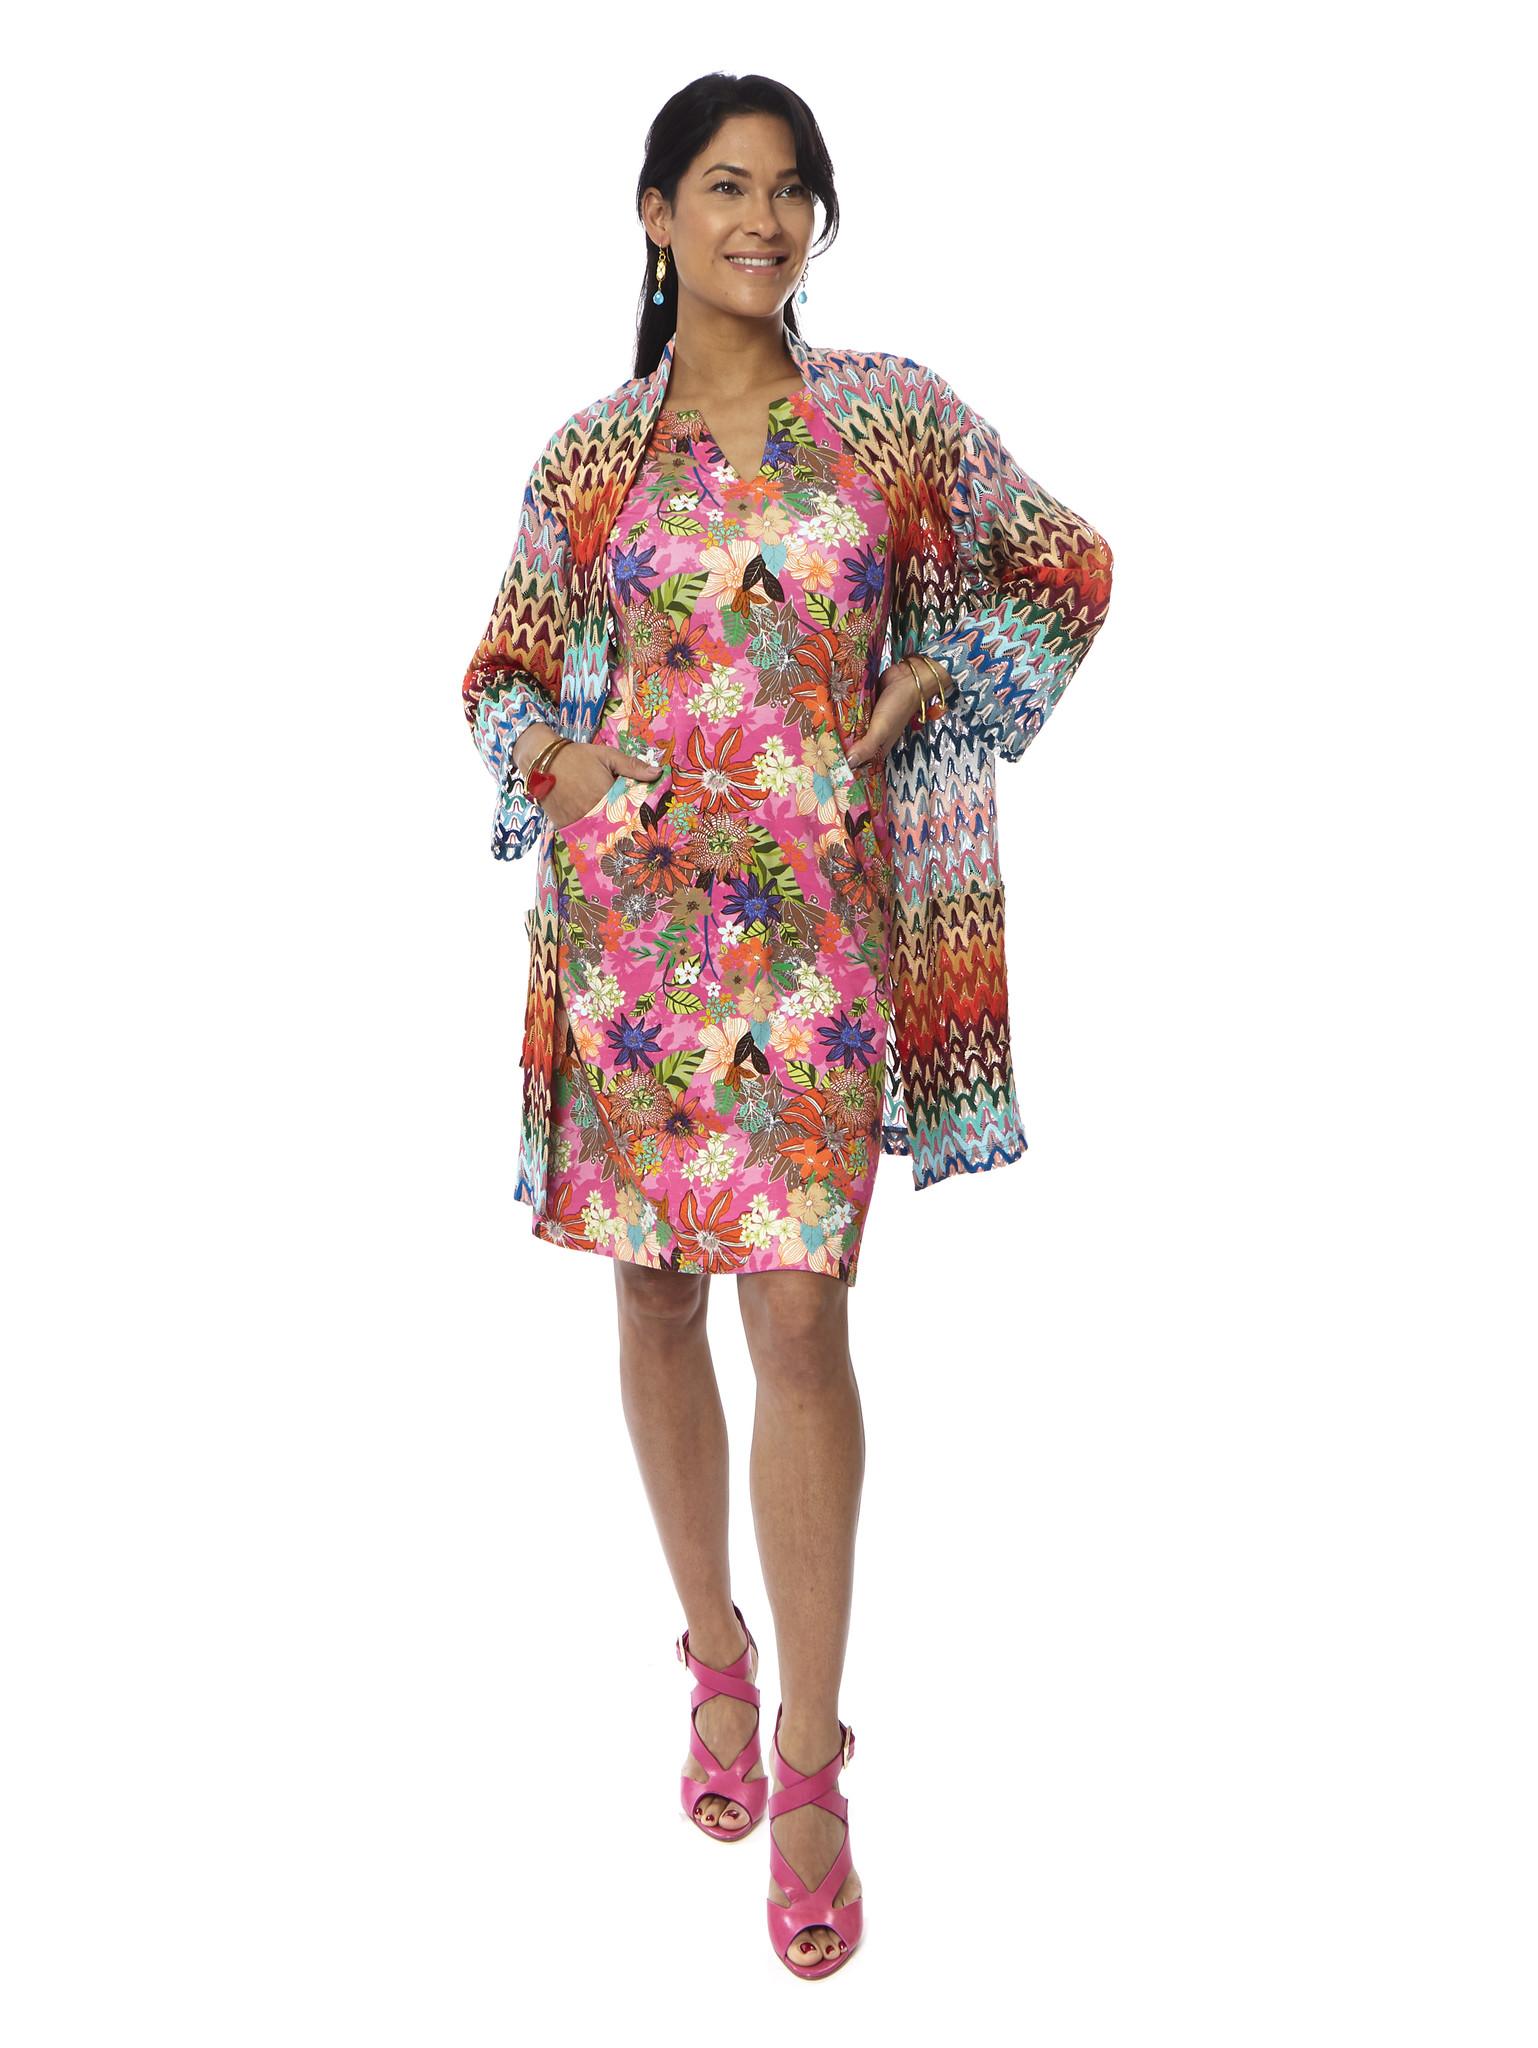 TESSA KOOPS ANGELA BAHIA DRESS